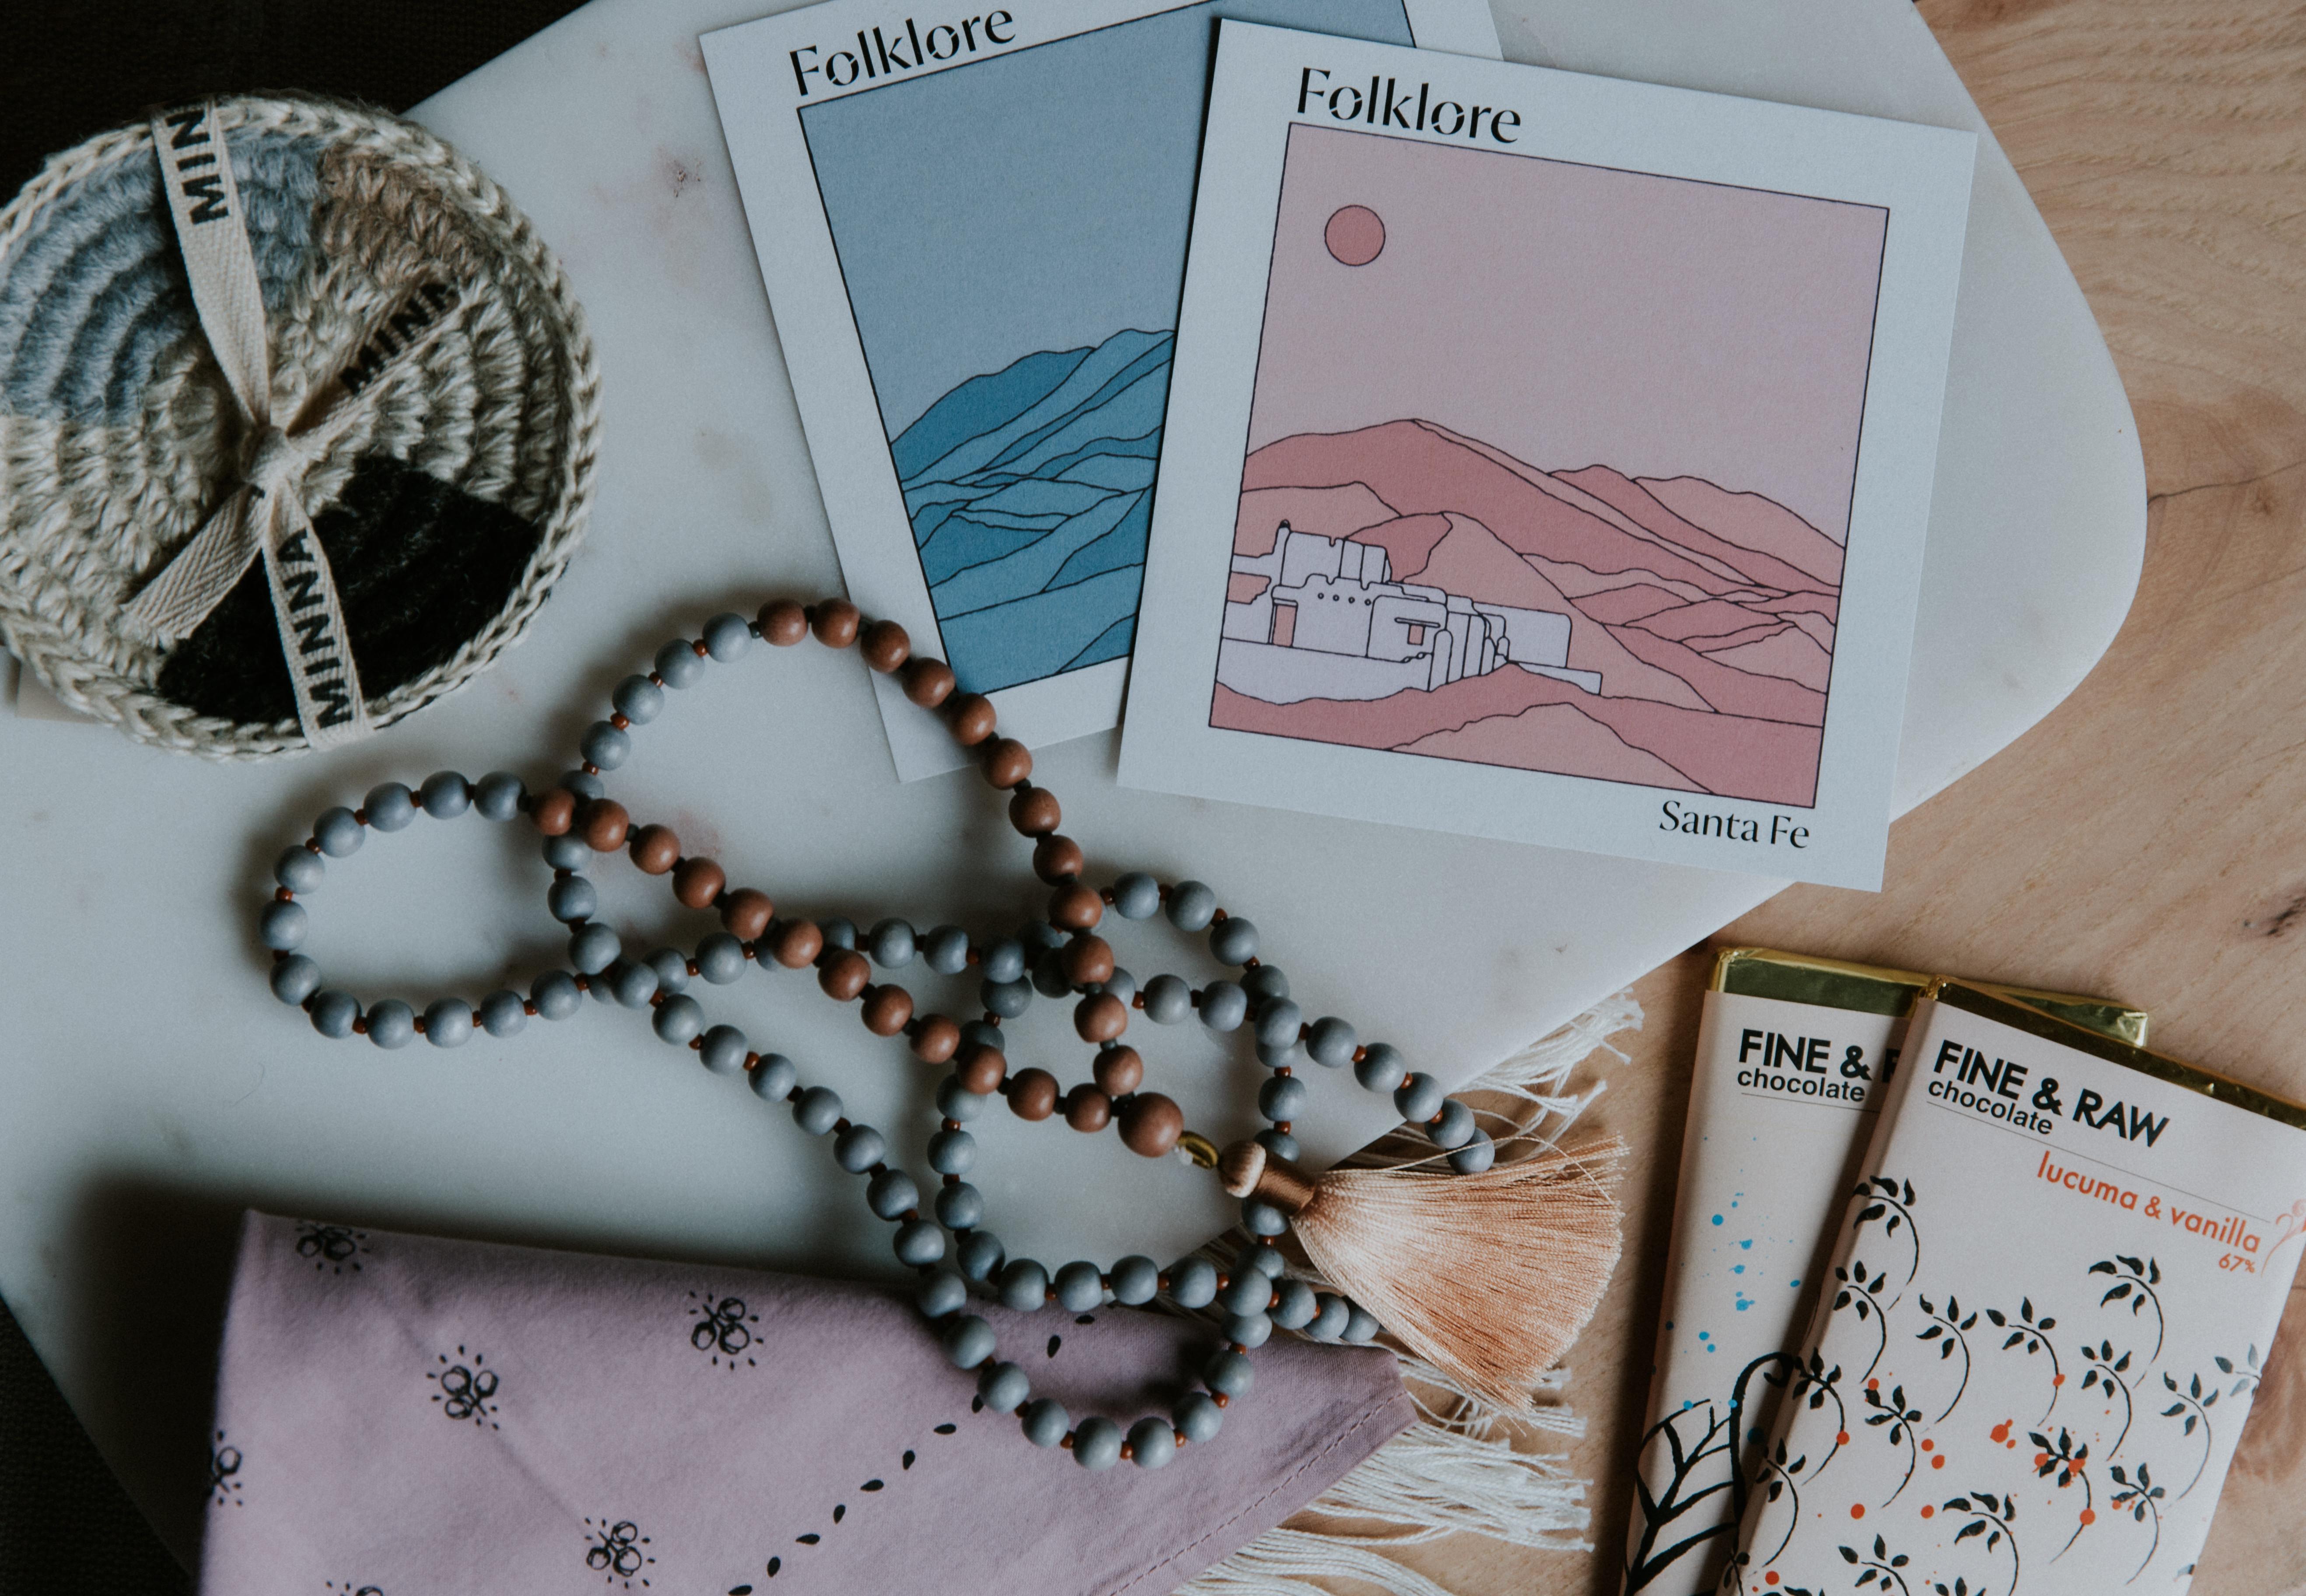 Folklore-89